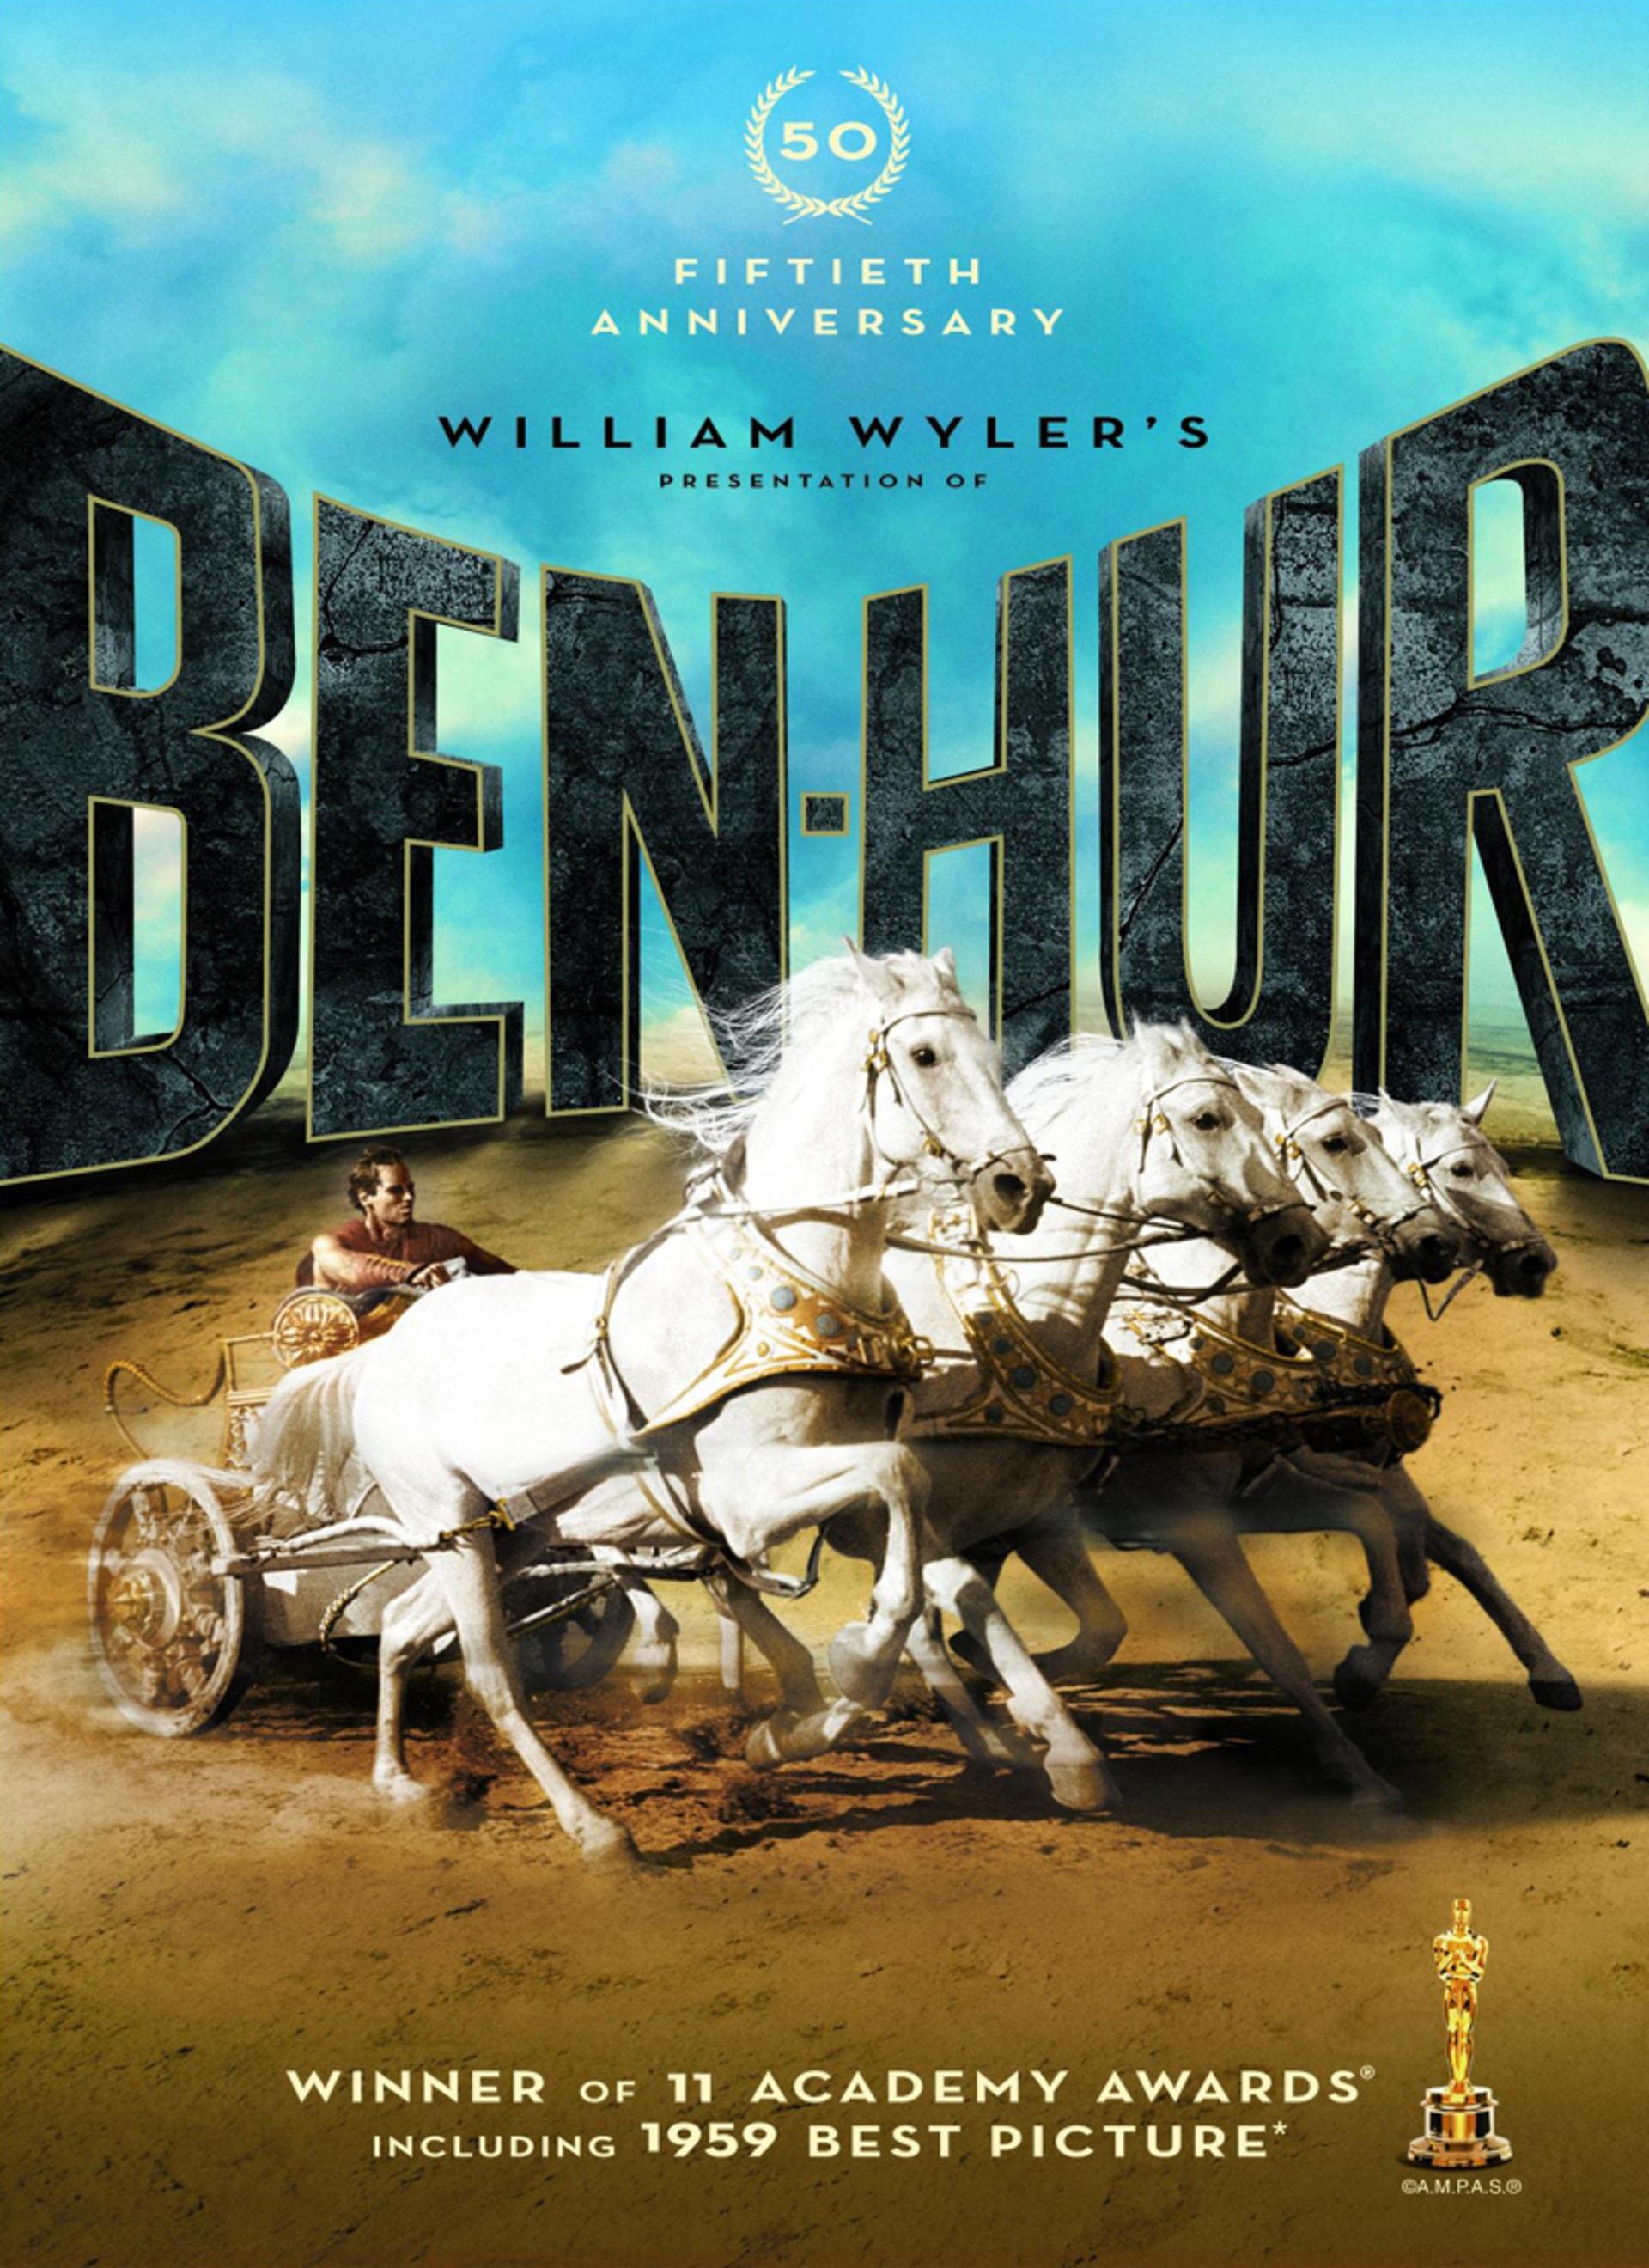 Ben-Hur - Poster 1